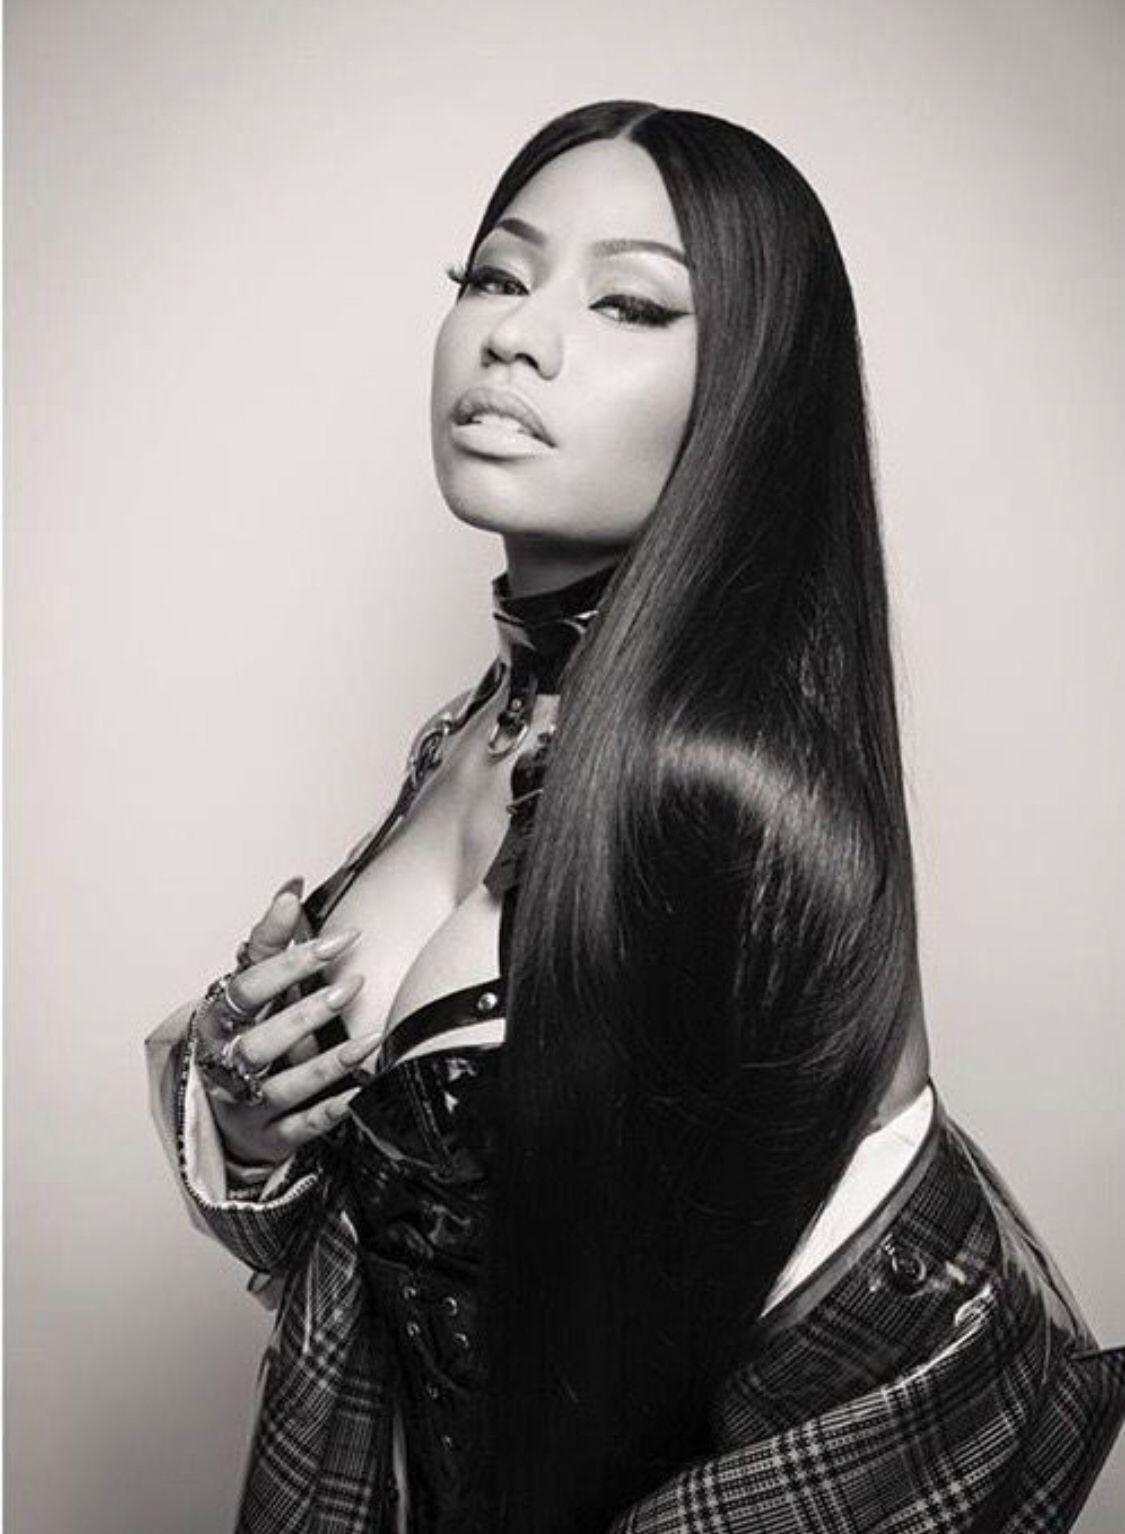 Nicki Minaj Queen Nicki minaj barbie, Nicki minaj wallpaper